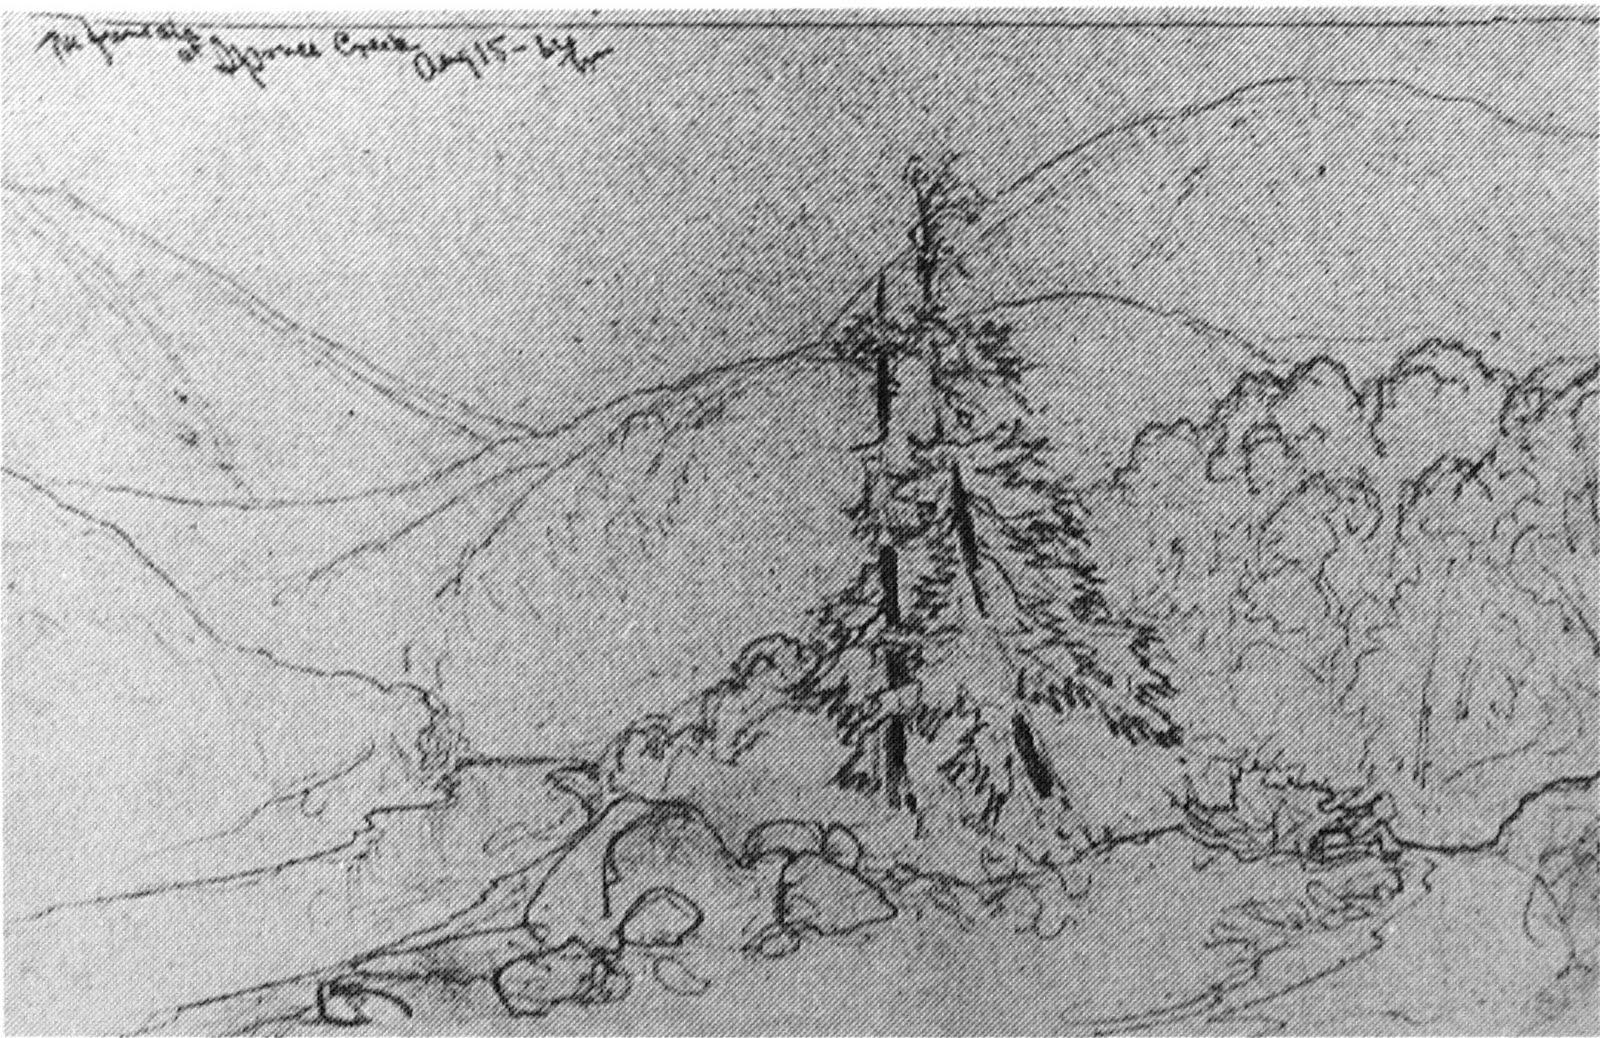 Pennsylvania HSR: Spruce Creek and Juniata Valley Images